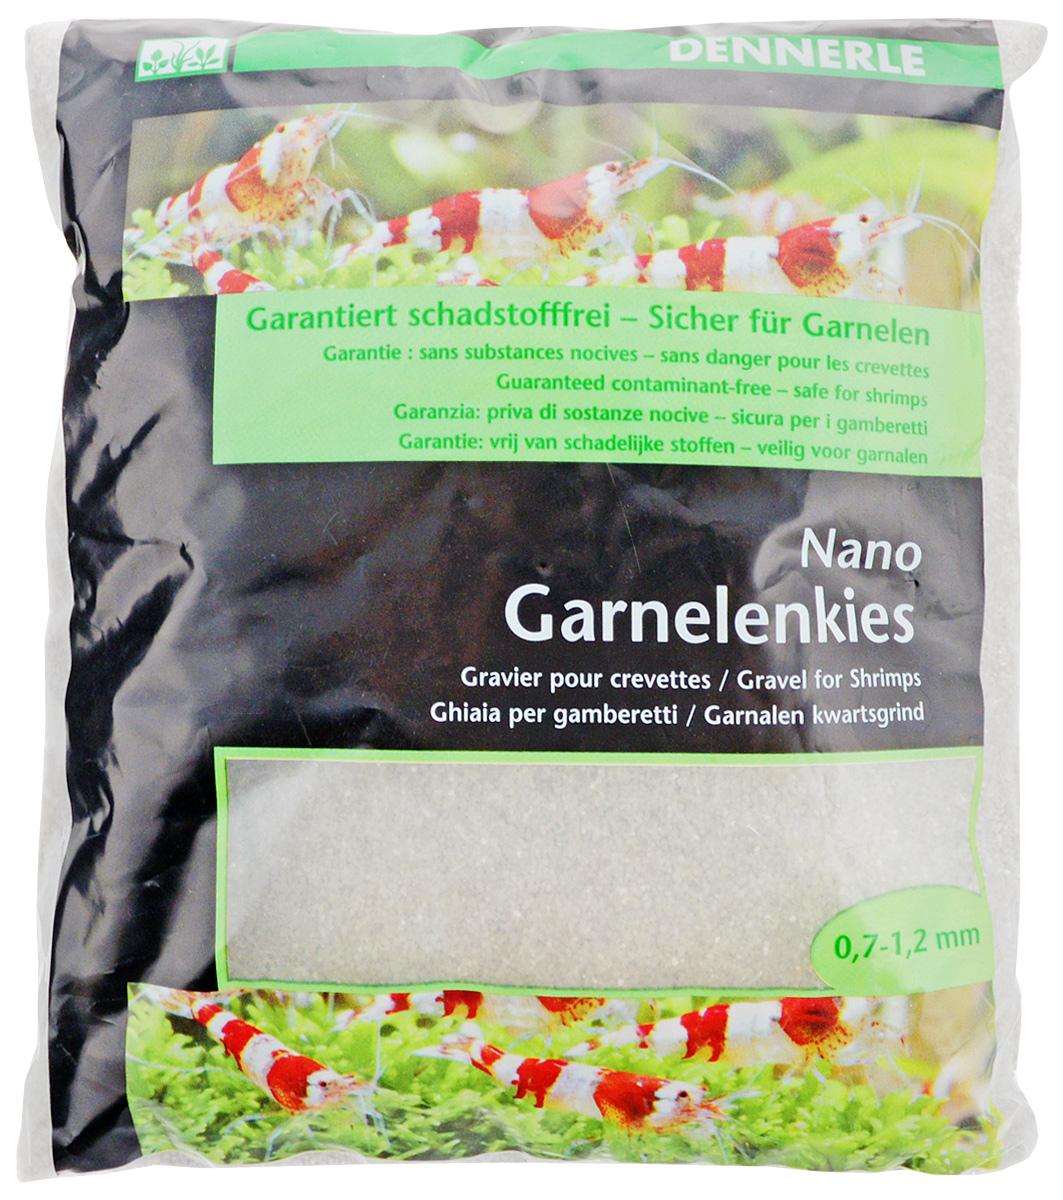 Грунт для аквариума Dennerle Nano Garnelenkies, натуральный, цвет: светло-серый, 0,7-1,2 мм, 2 кг грунт для аквариума dennerle кристал кварц сланцево серый 1 2мм 10кг